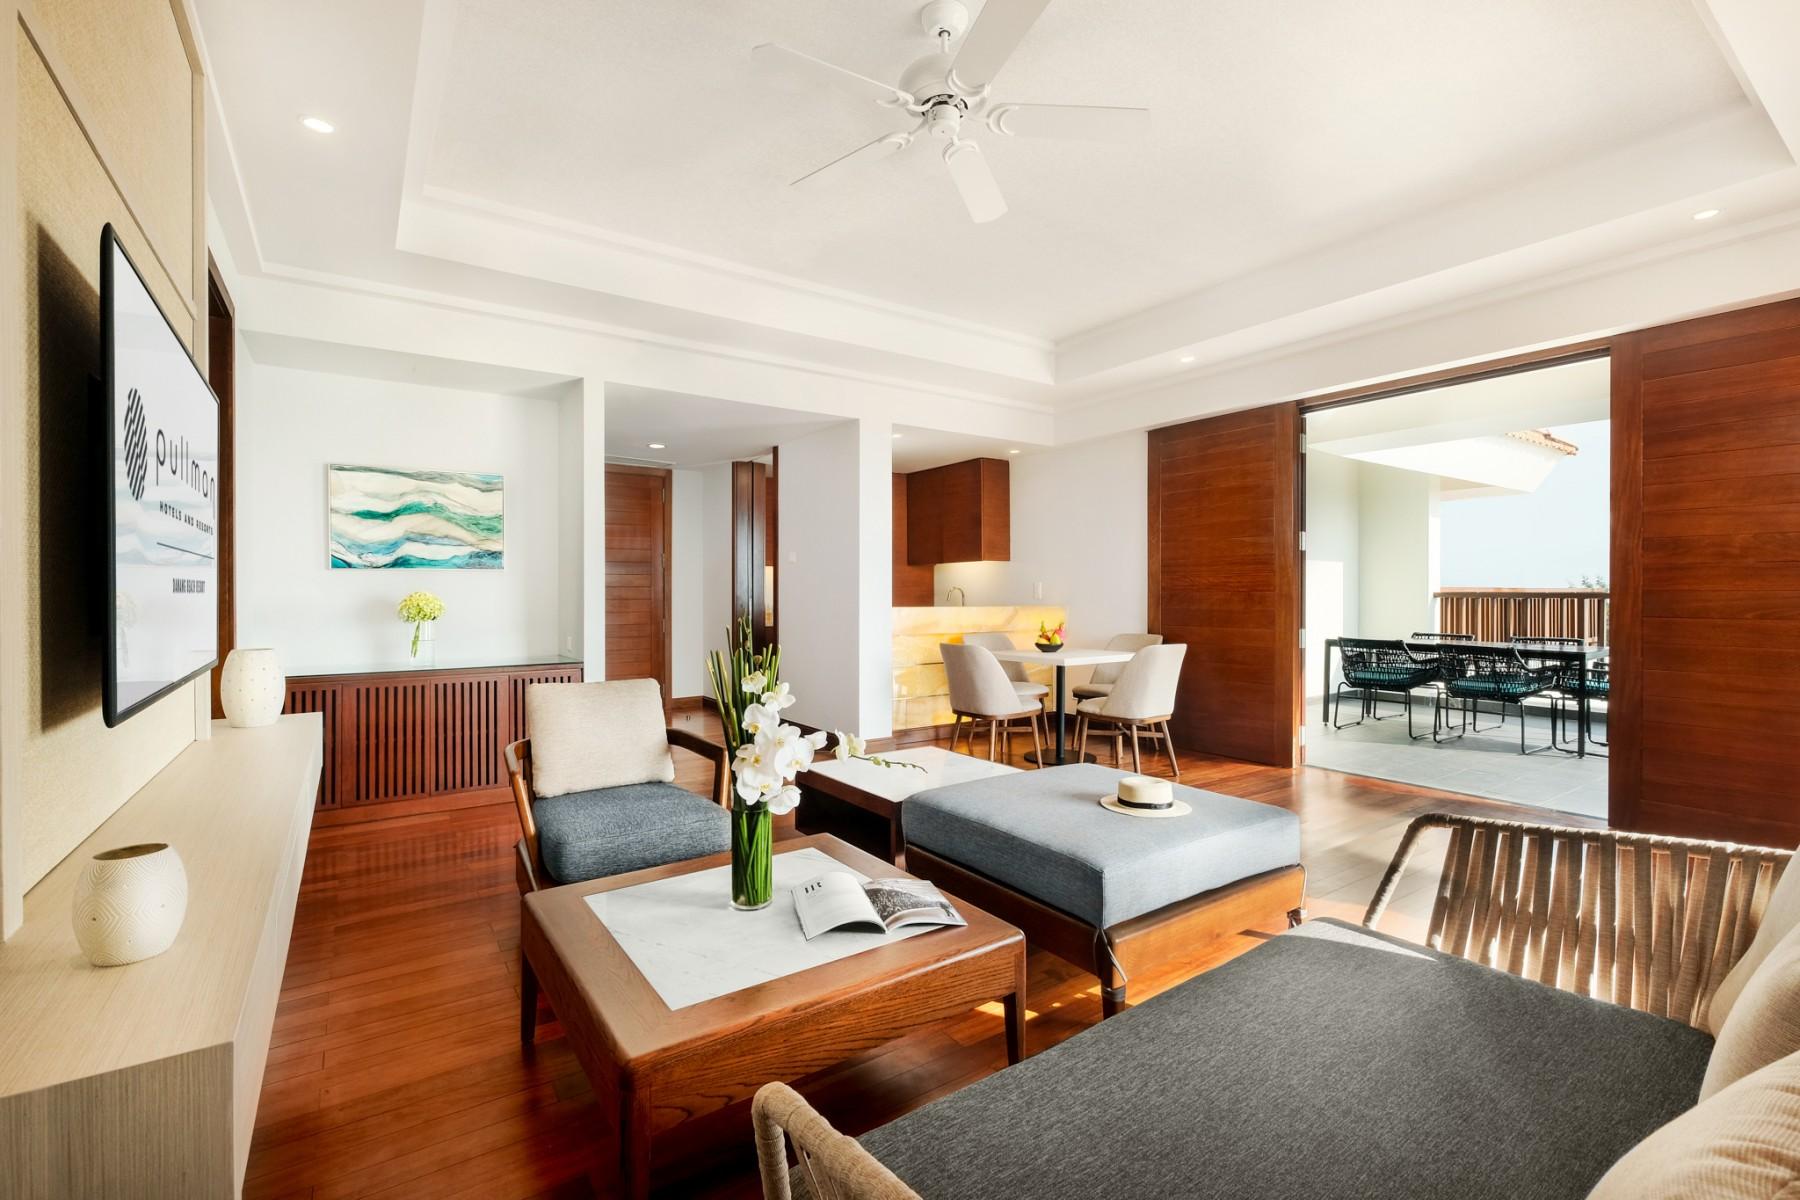 Penthouse Suite Pullman Danang Beach Resort 5 Star Hotels